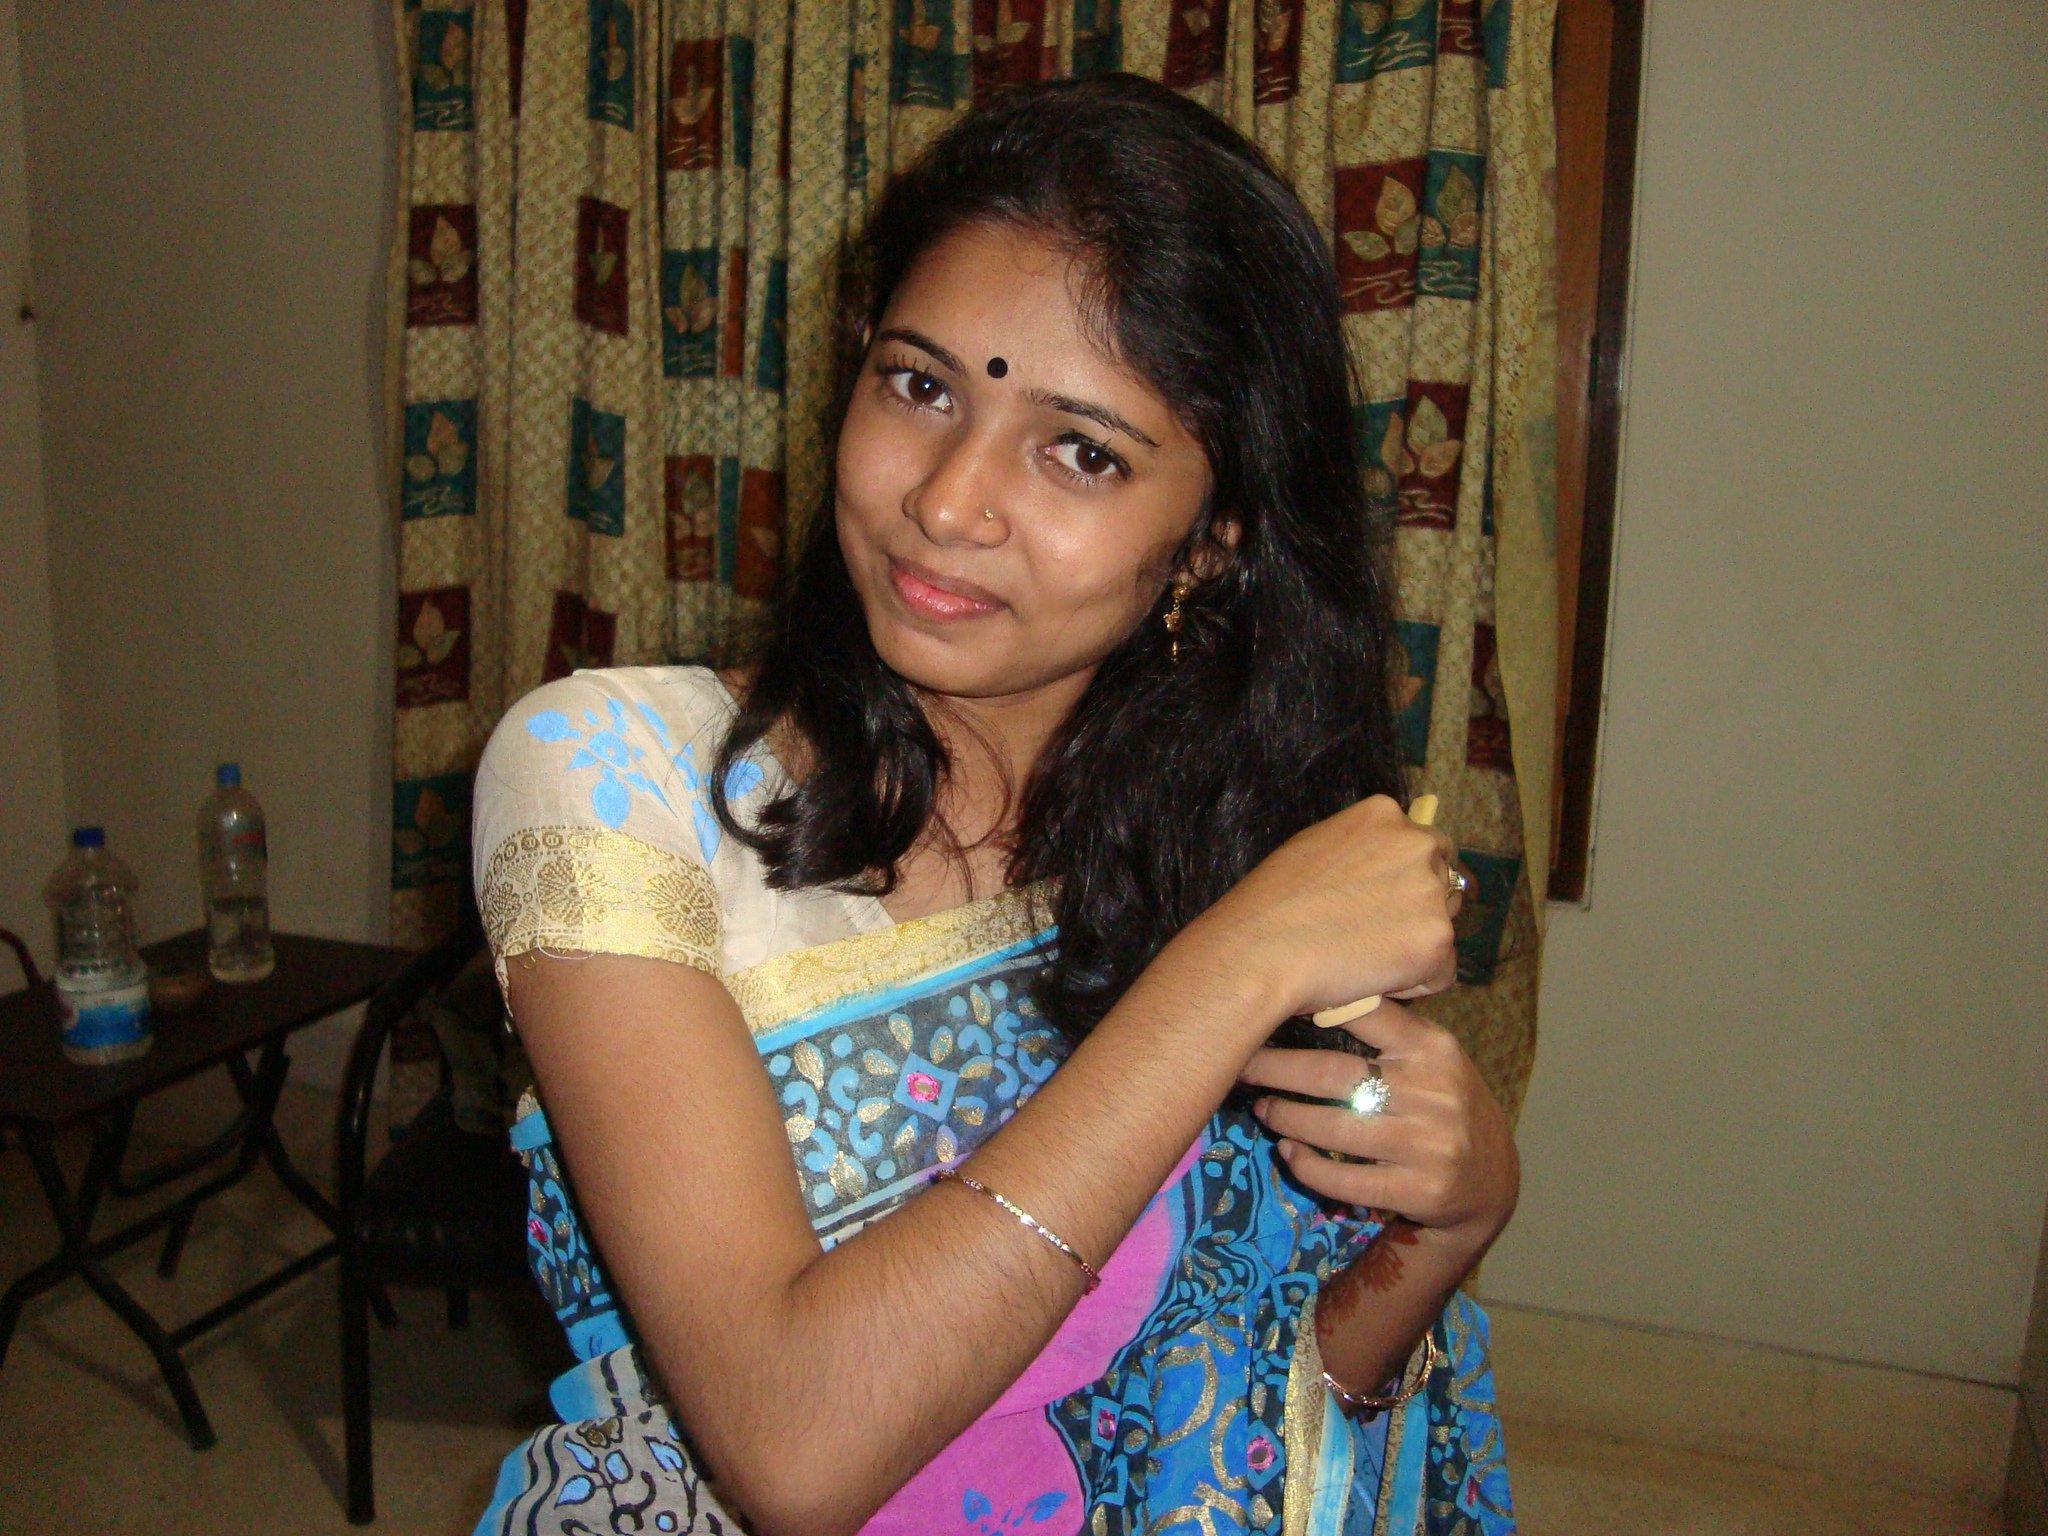 My friend, Female, Friend, Girl, Indian, HQ Photo